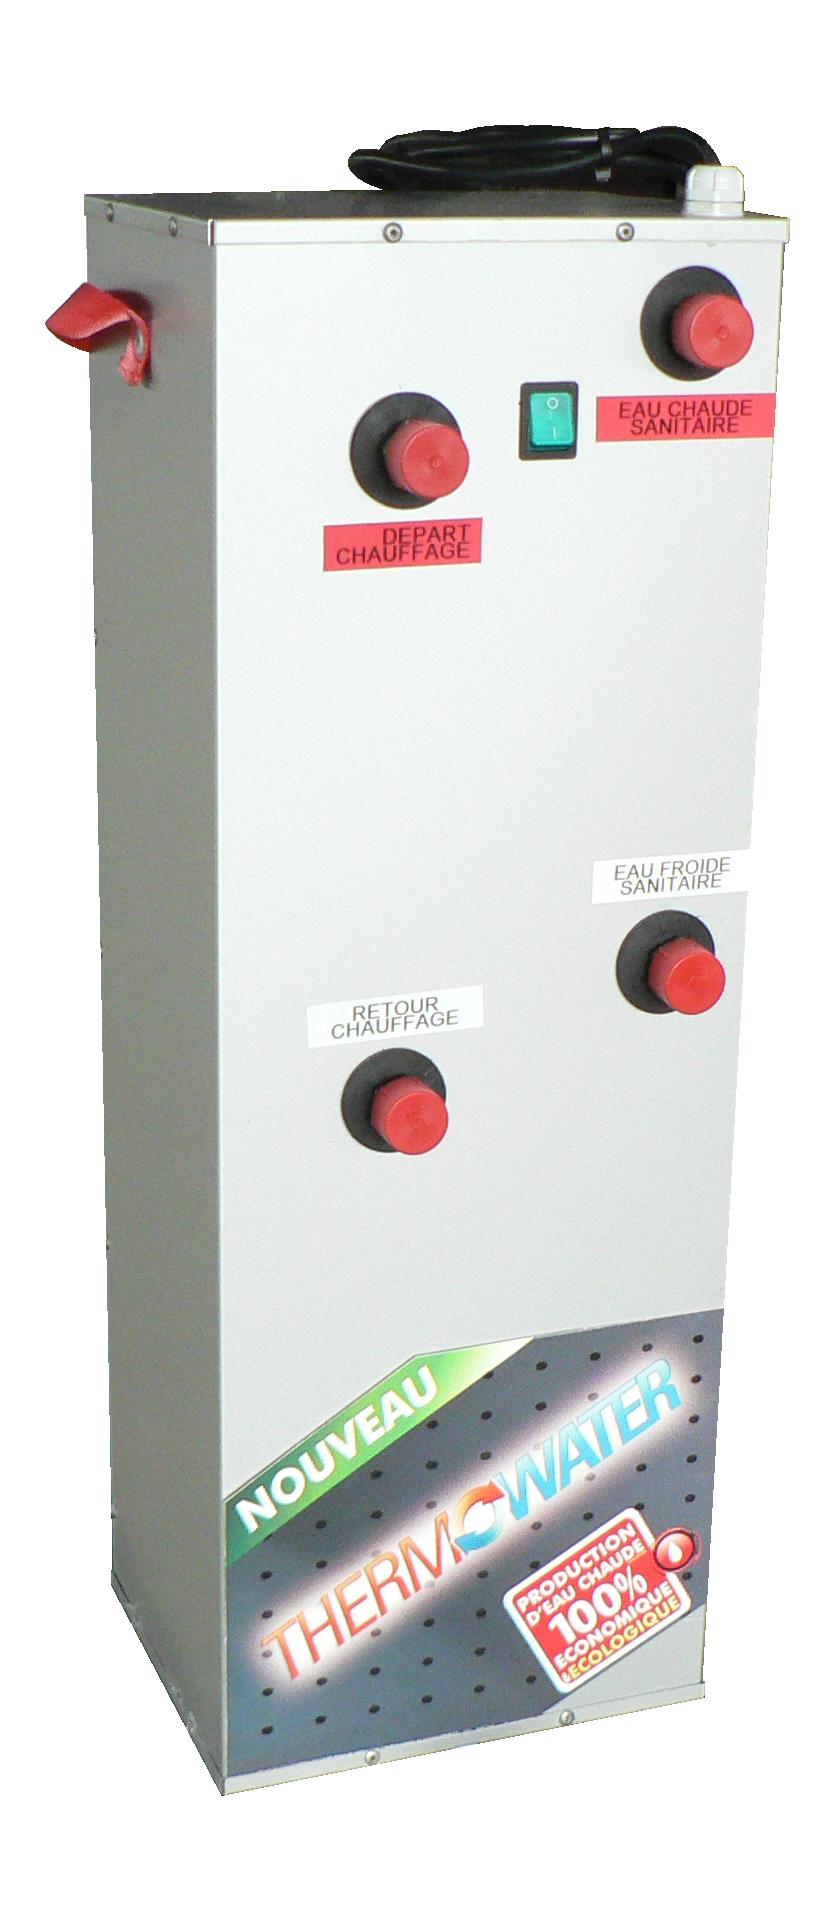 thermowatercae-chaufe eau thermodynamique-chauffage